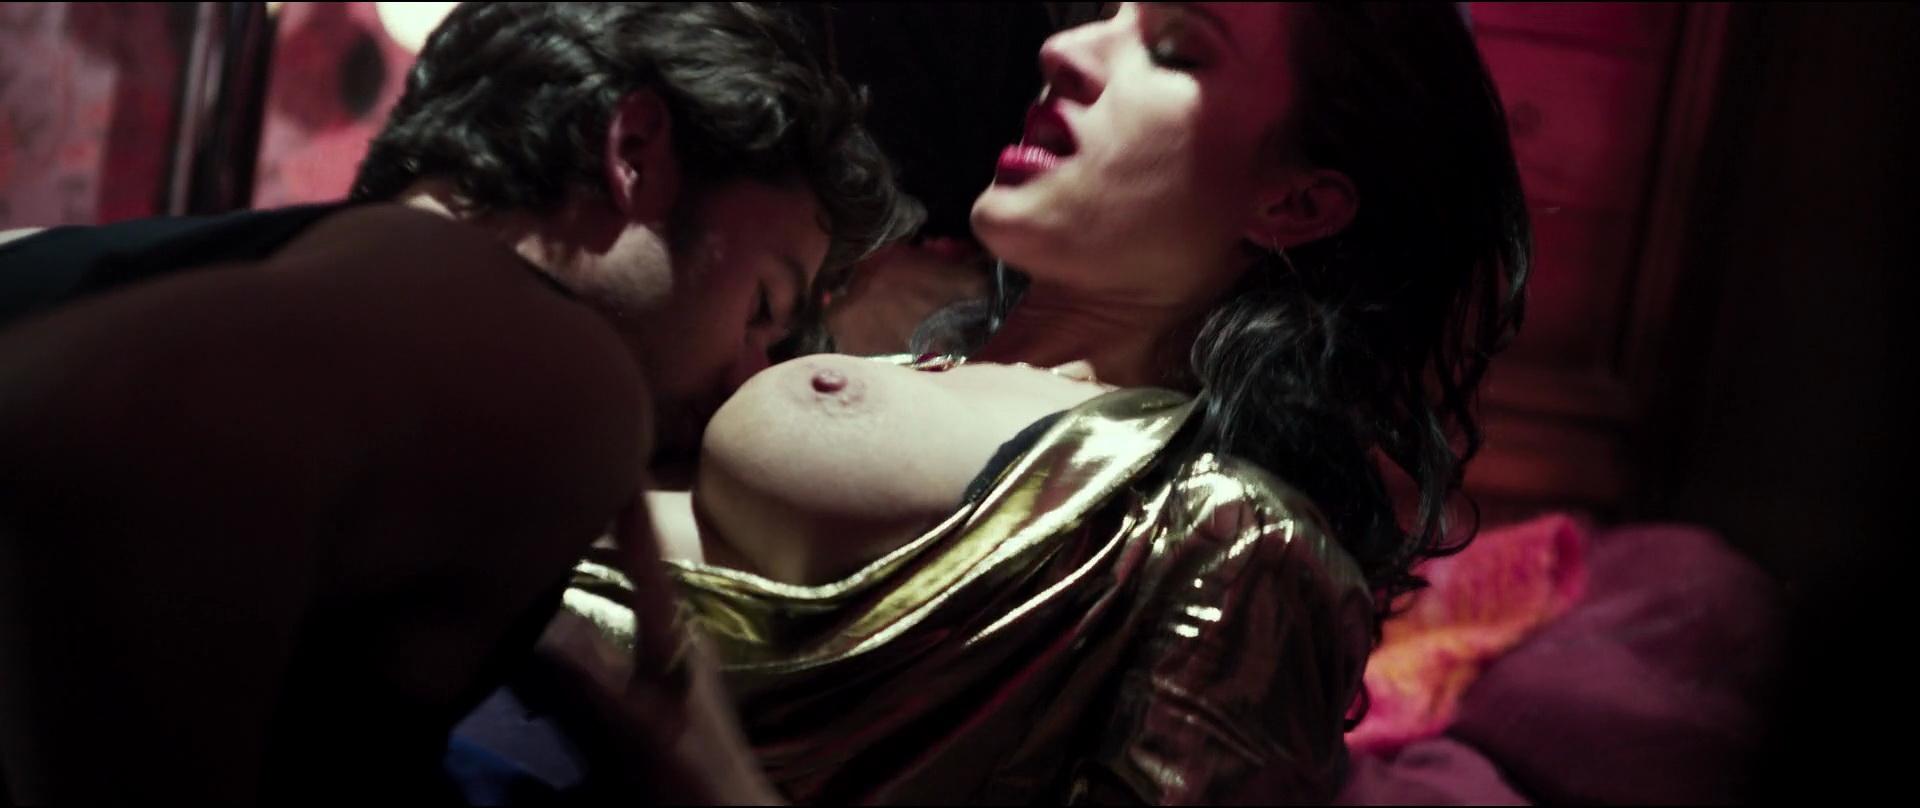 Amy Weber Sex Scene movie nudity » page 450 » nudecelebvideo - your box of nude